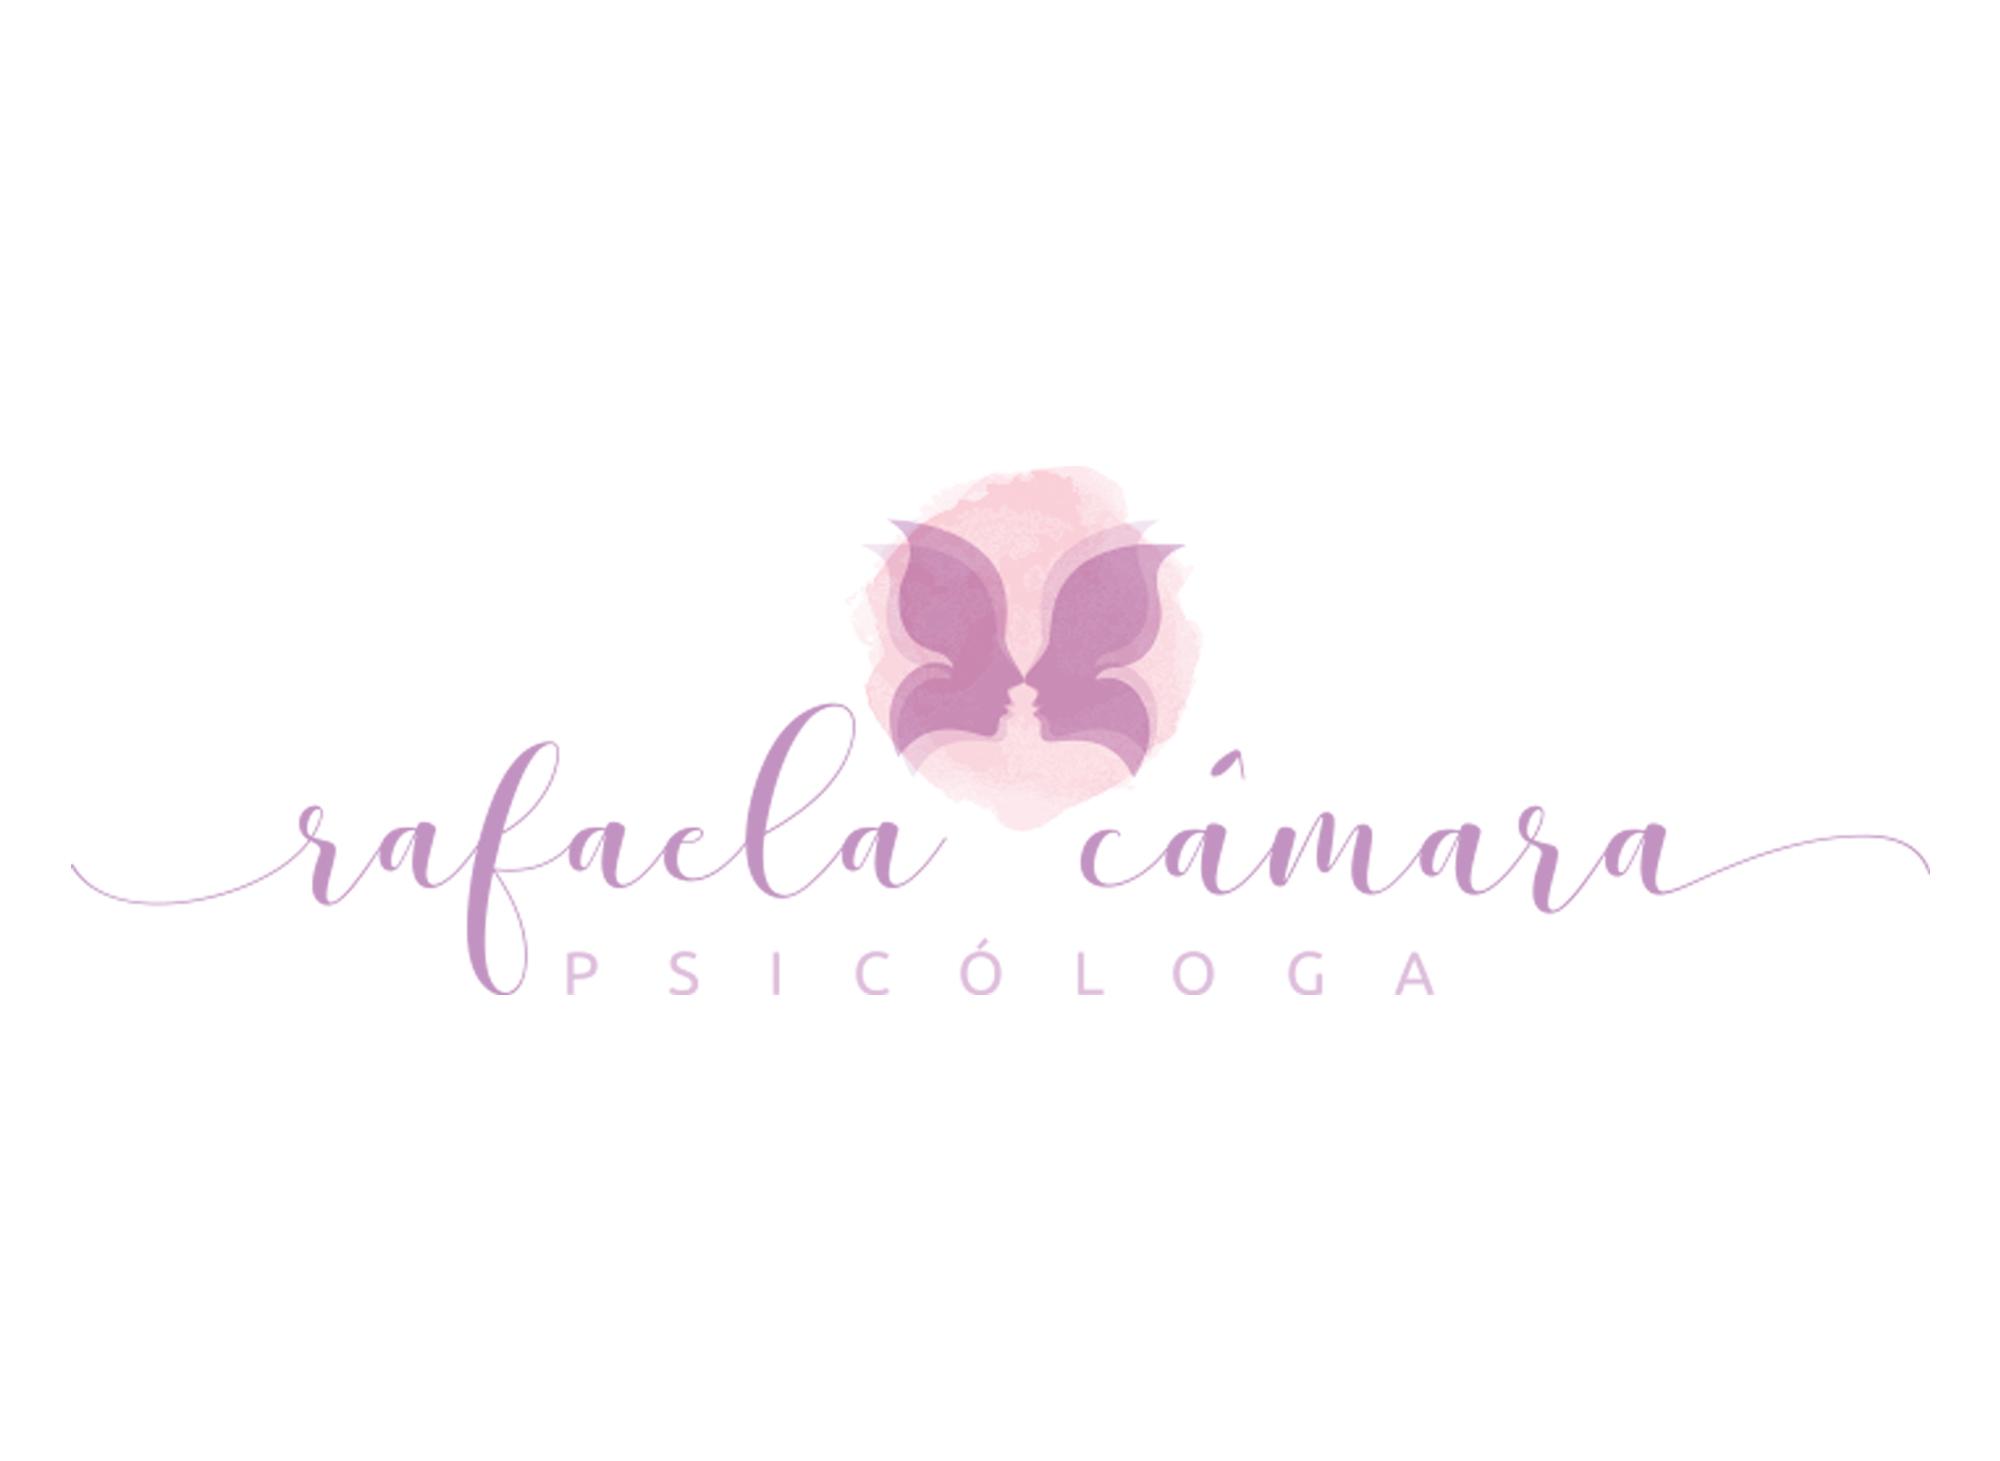 rafaela-camara-psicologa-cliente-agencia-diretriz-digital-marketing-fortaleza